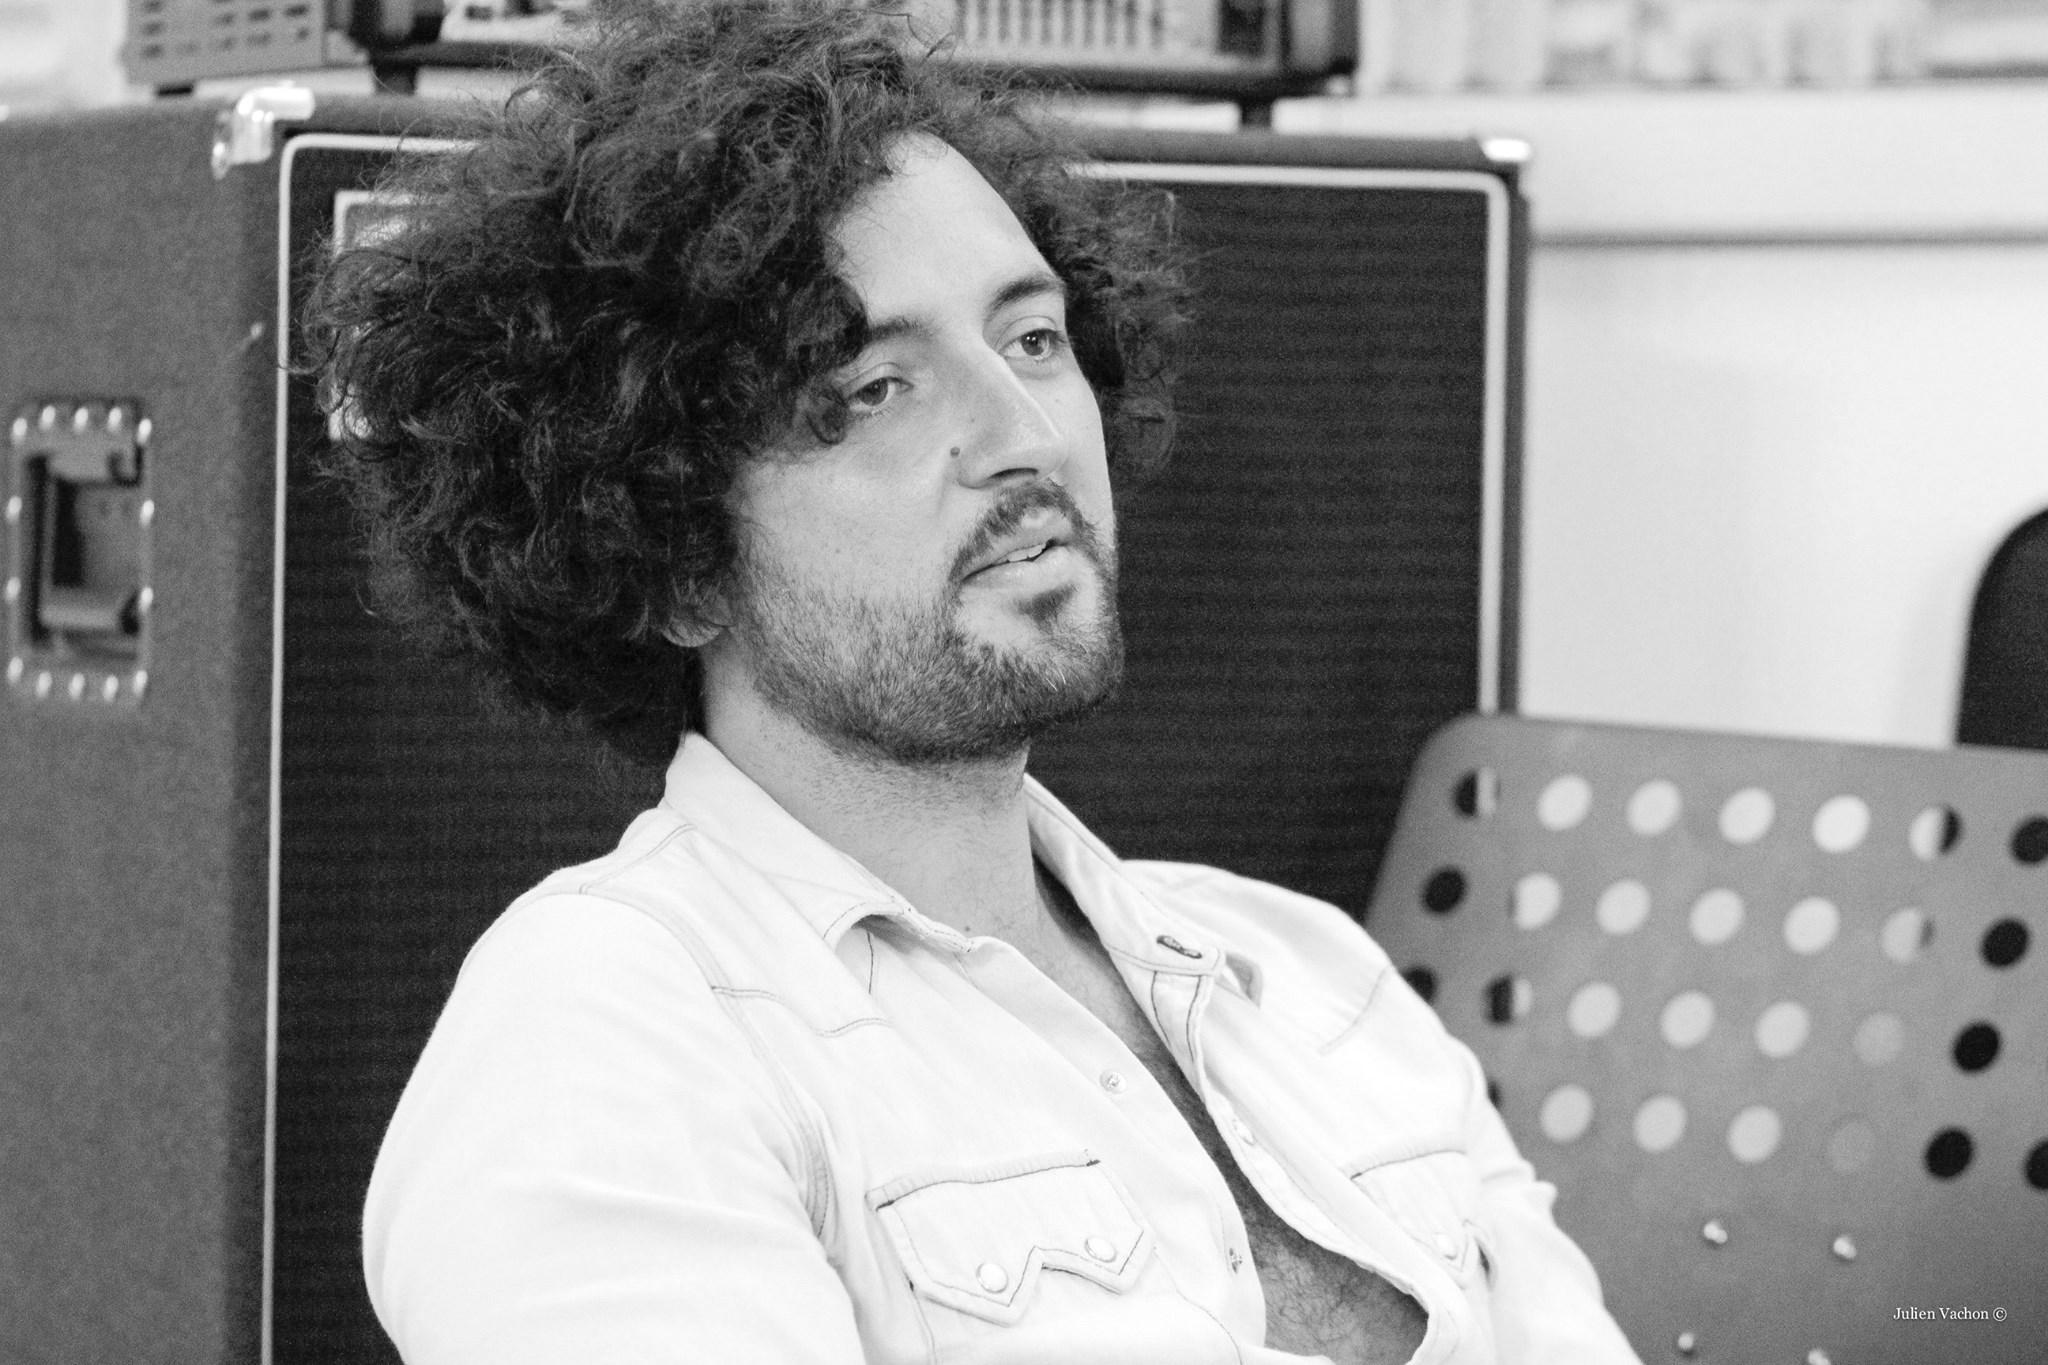 Jérôme Quériaud - OUI FM